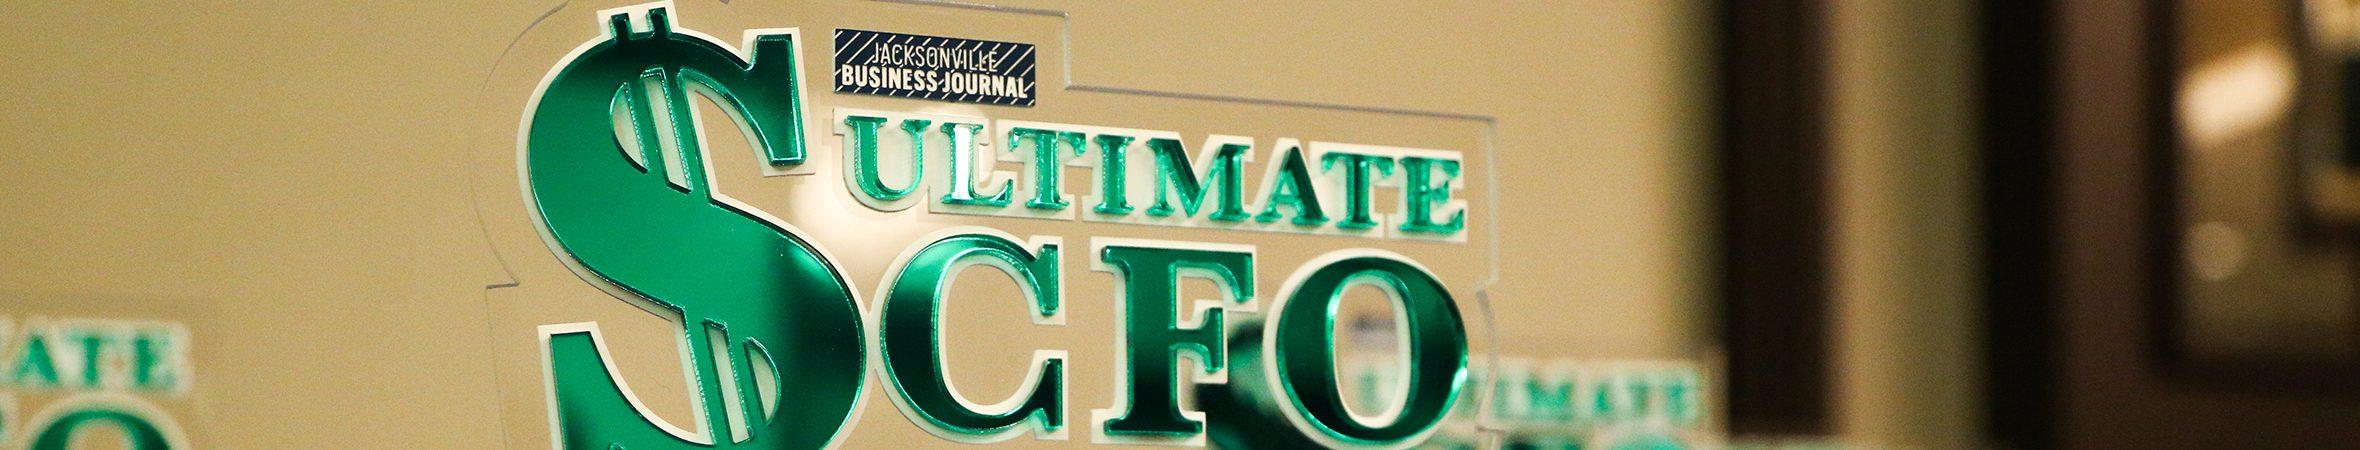 JBJ Ultimate CFO